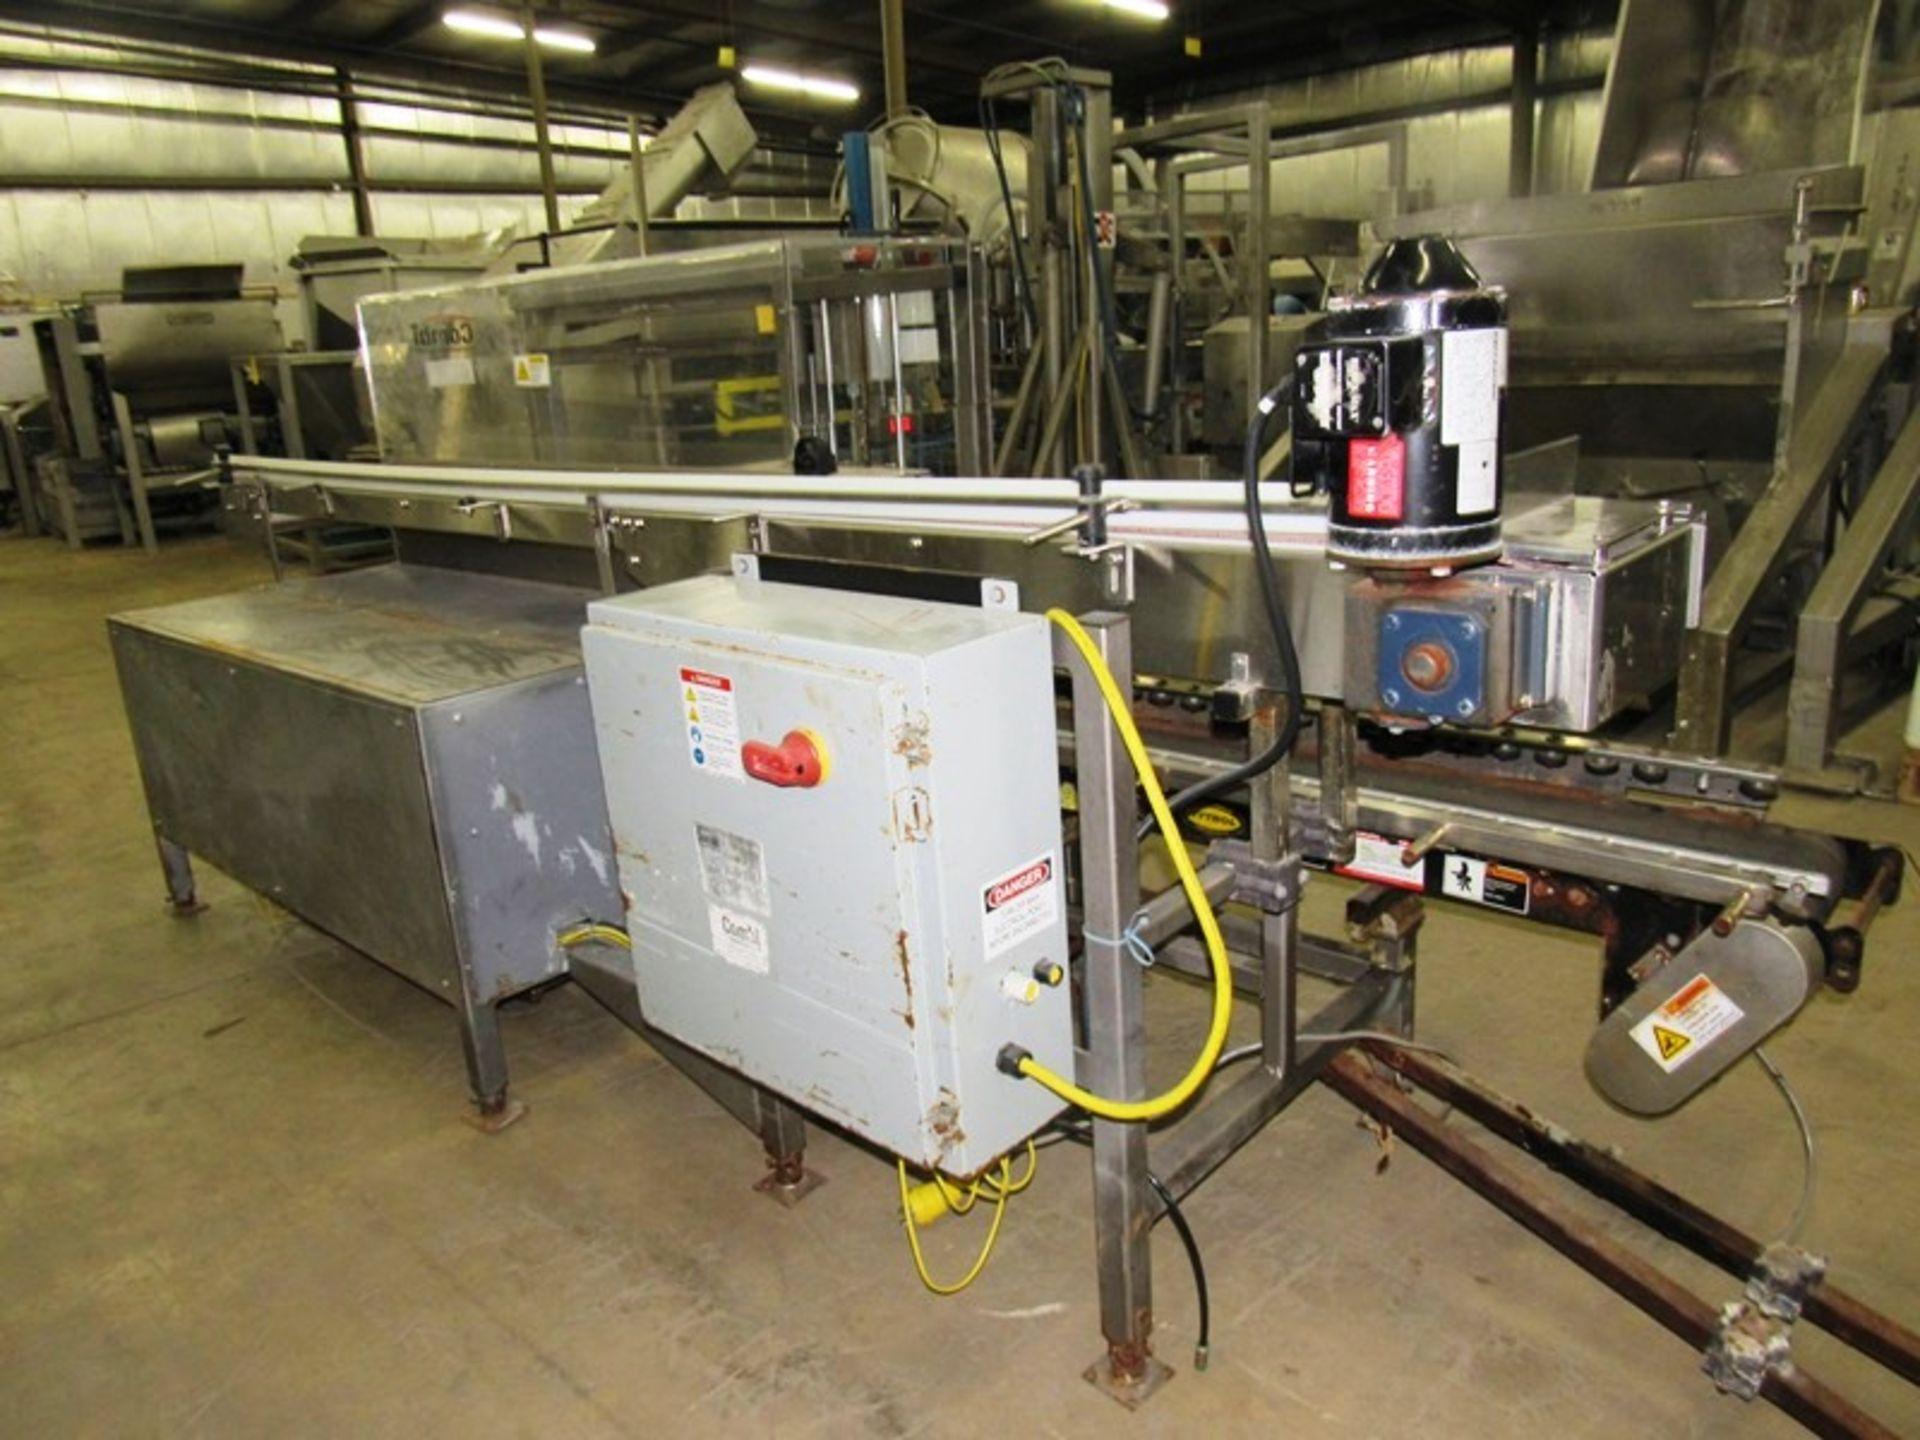 Lot 5 - Combi Mdl. 2CE Ergo Pack Semi Automatic Case Sealer, Ser. #2CE07190263, 460 volts